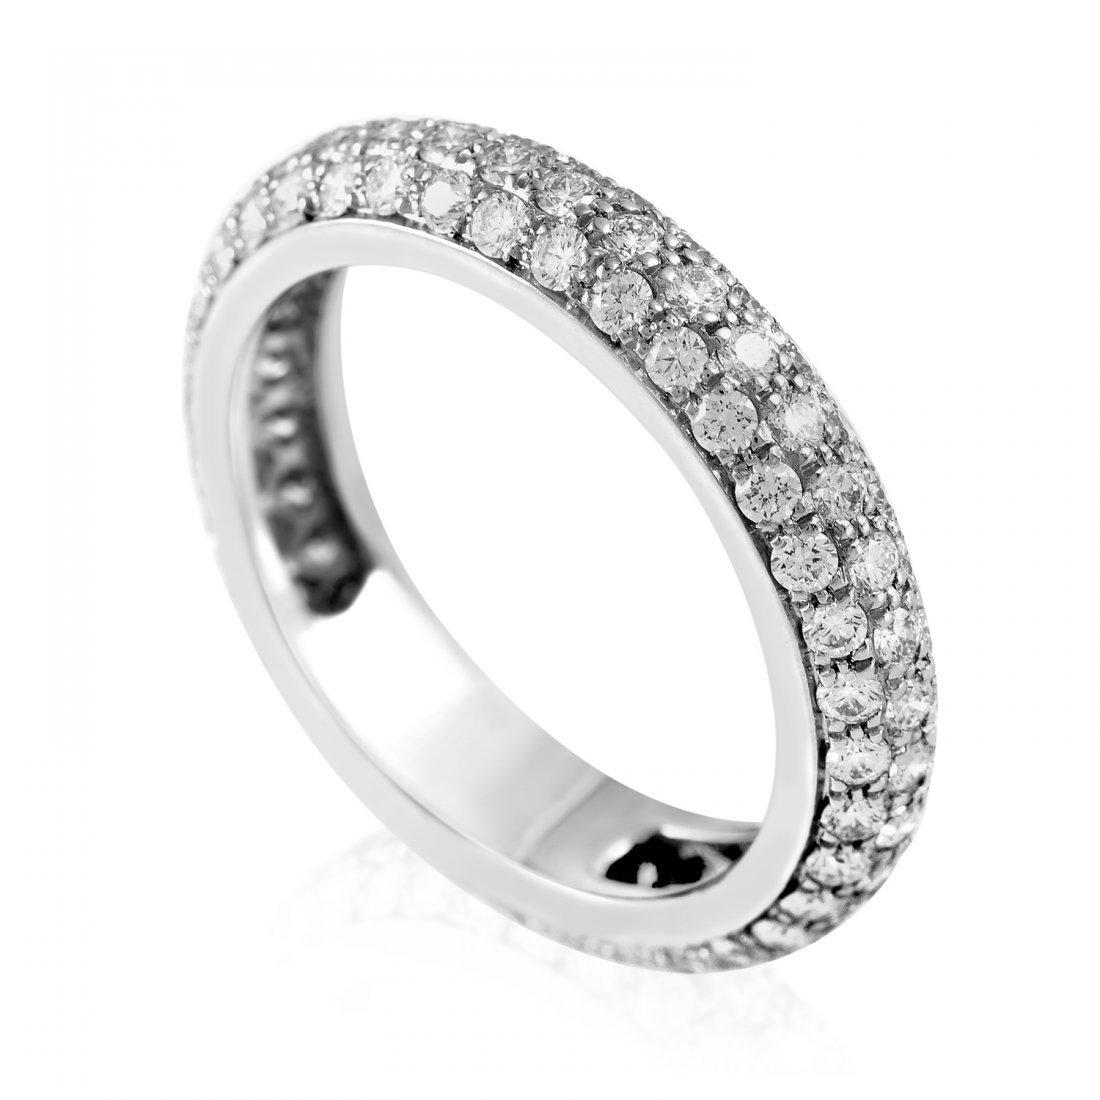 Cartier 18K White Gold Diamond Pave Eternity Band